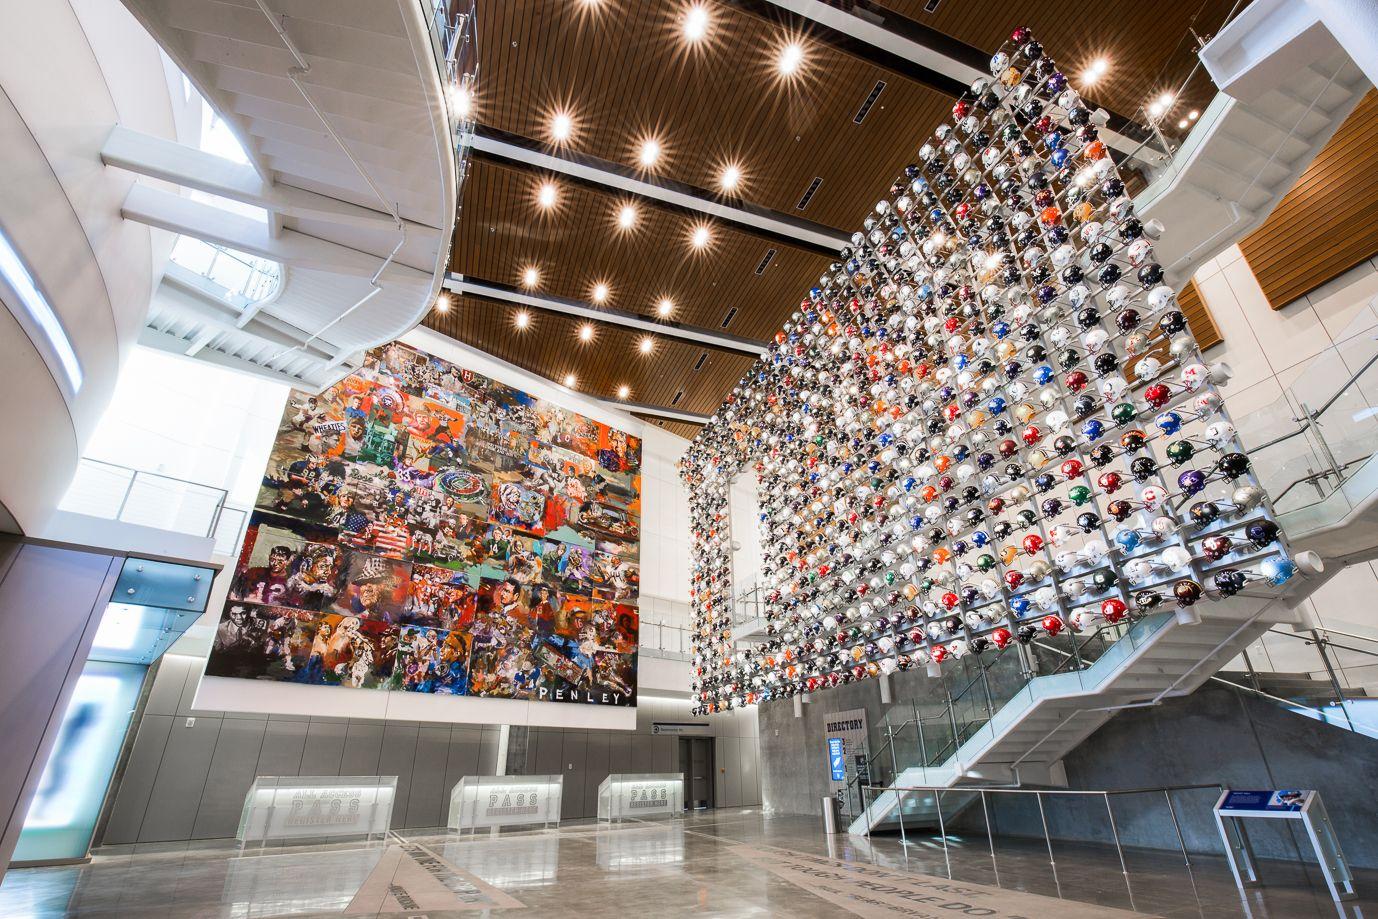 College Football Hall of Fame #tvsdesign http://bit.ly/1N8JUvP Atlanta sports architecture design